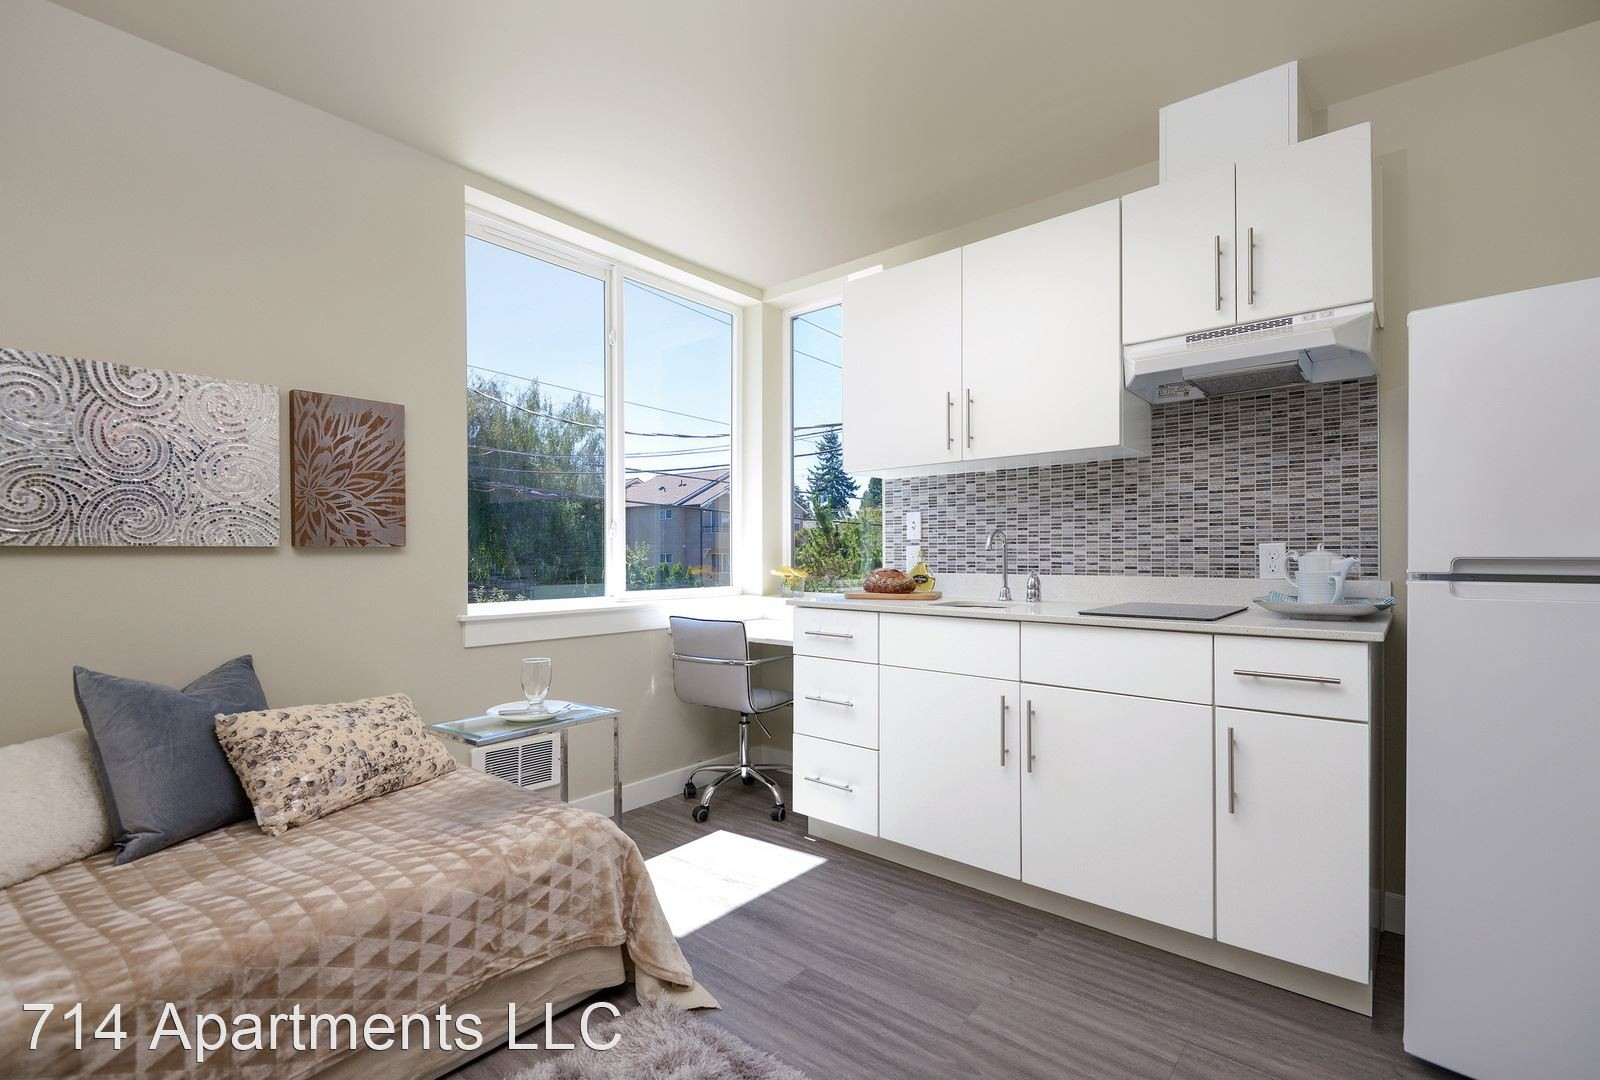 Apartments Near UW Cubix 95 for University of Washington Students in Seattle, WA